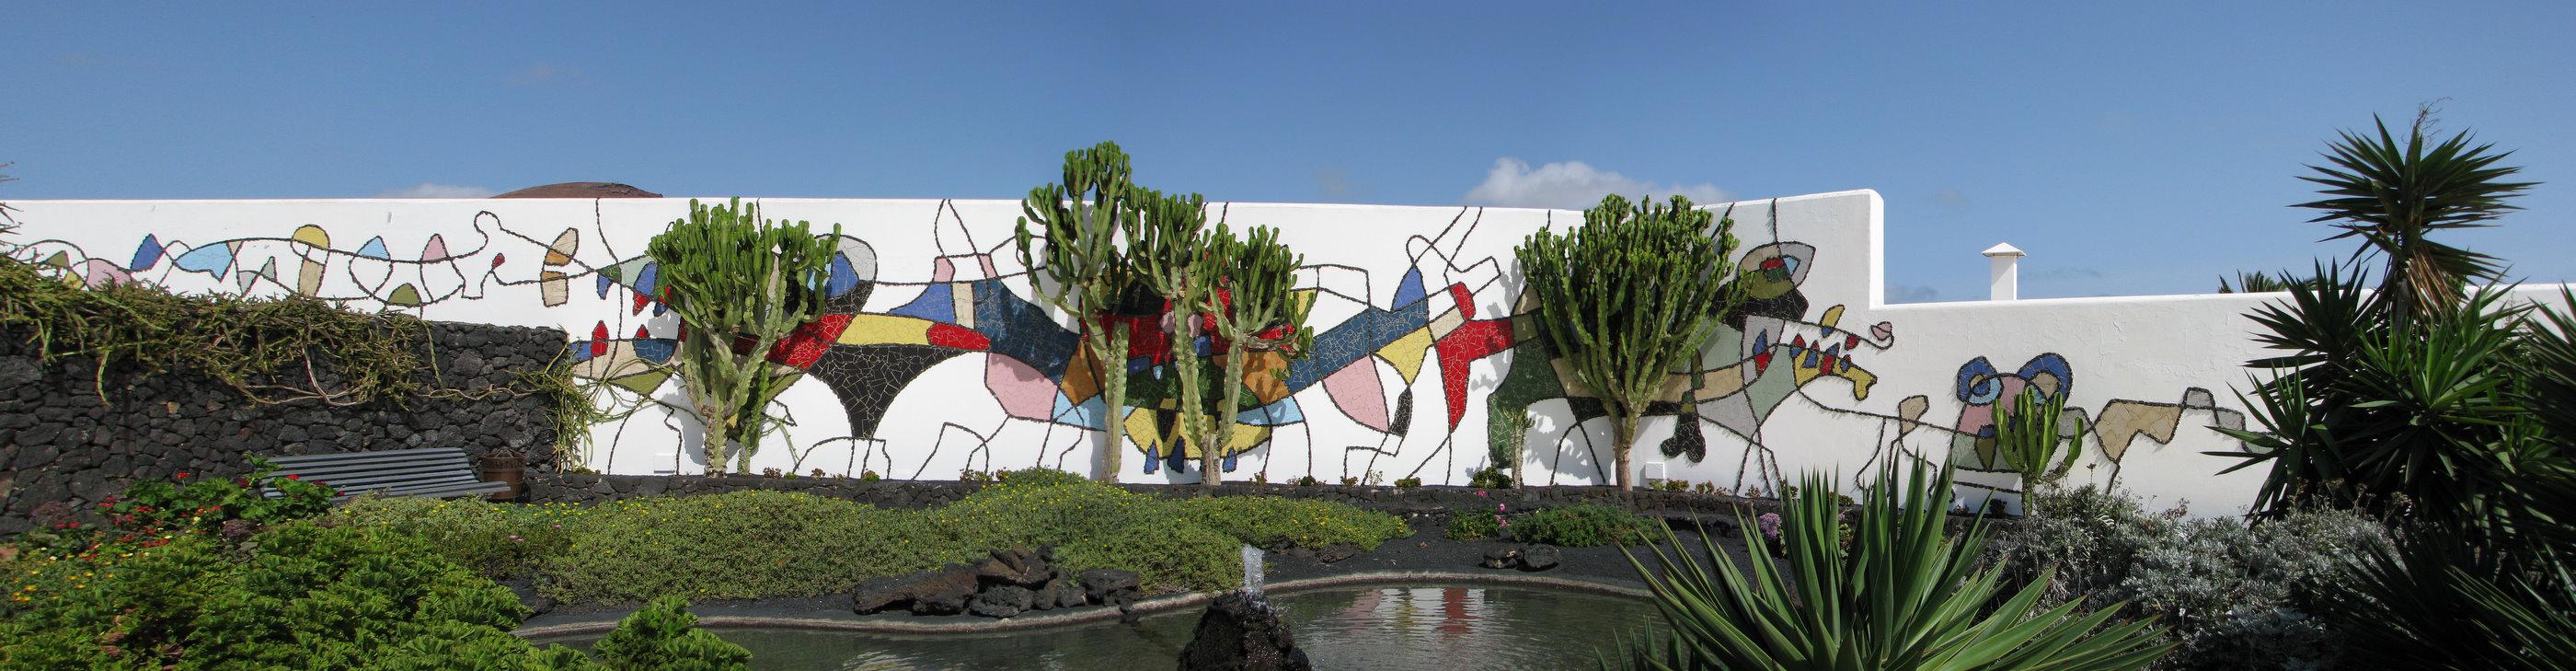 File fundacion cesar manrique mural xytram jpg - Cesar manrique wikipedia ...